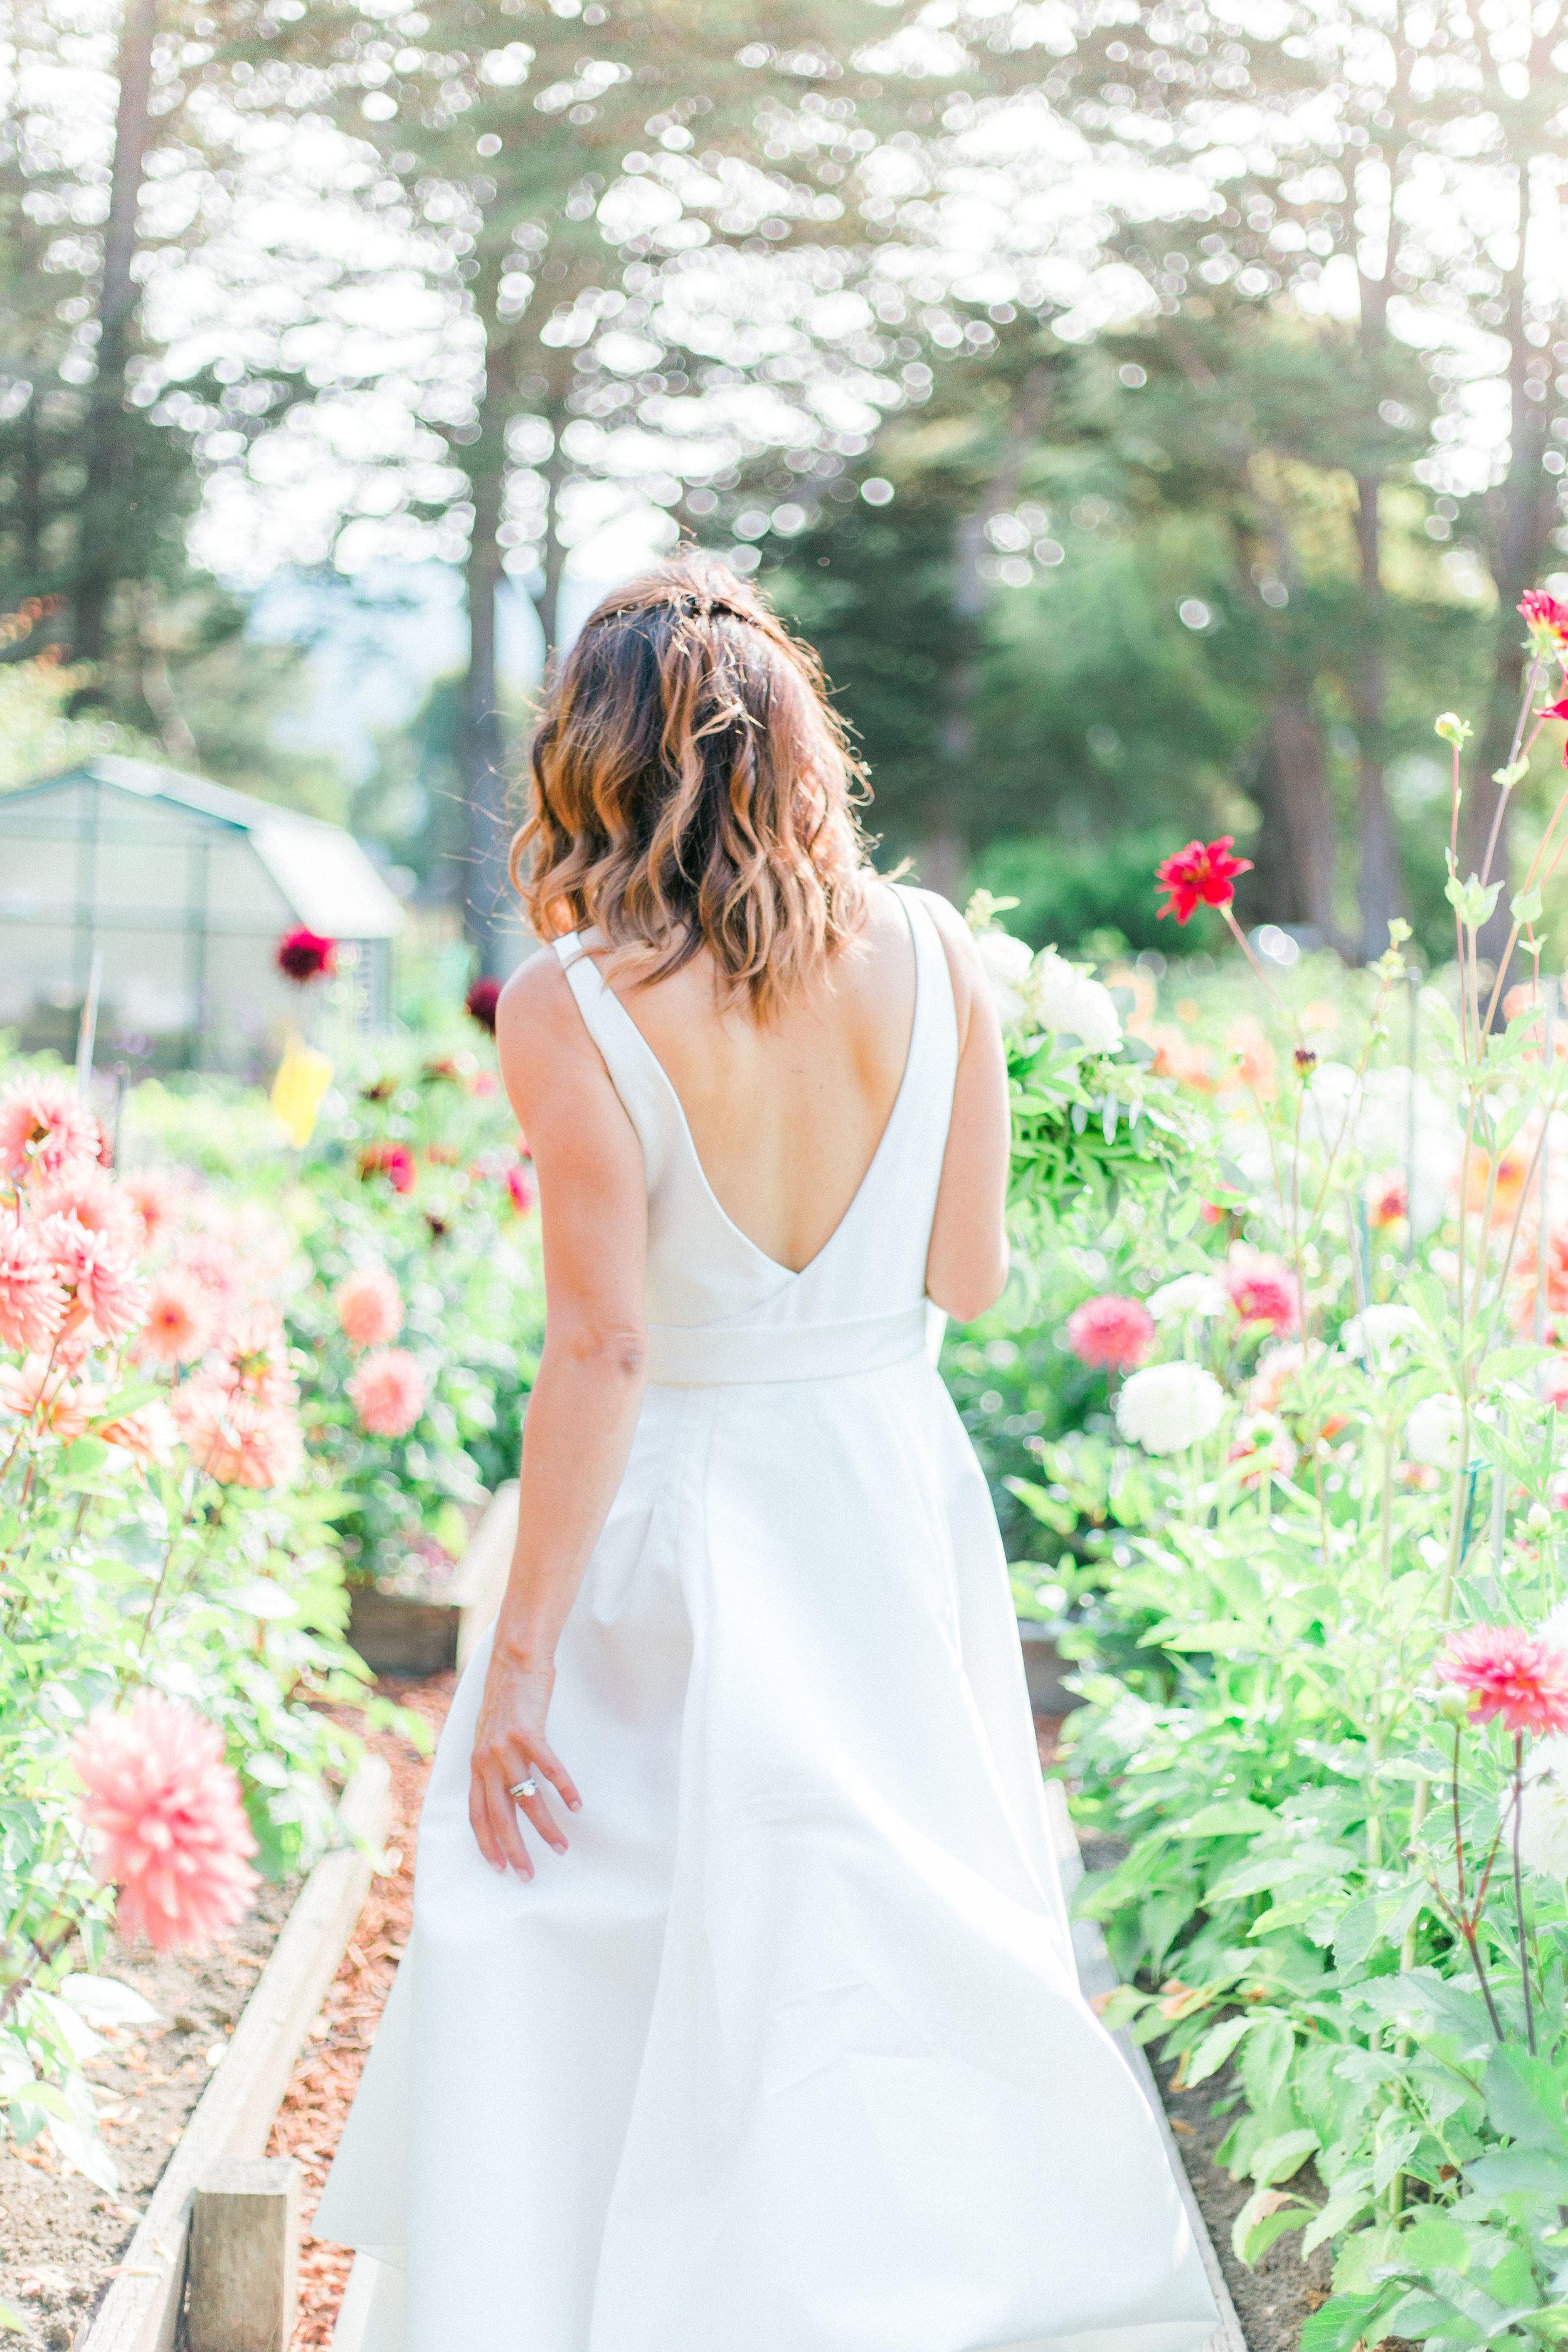 Holly-Nicholas-Wedding-by-JBJ-Pictures-226.jpg